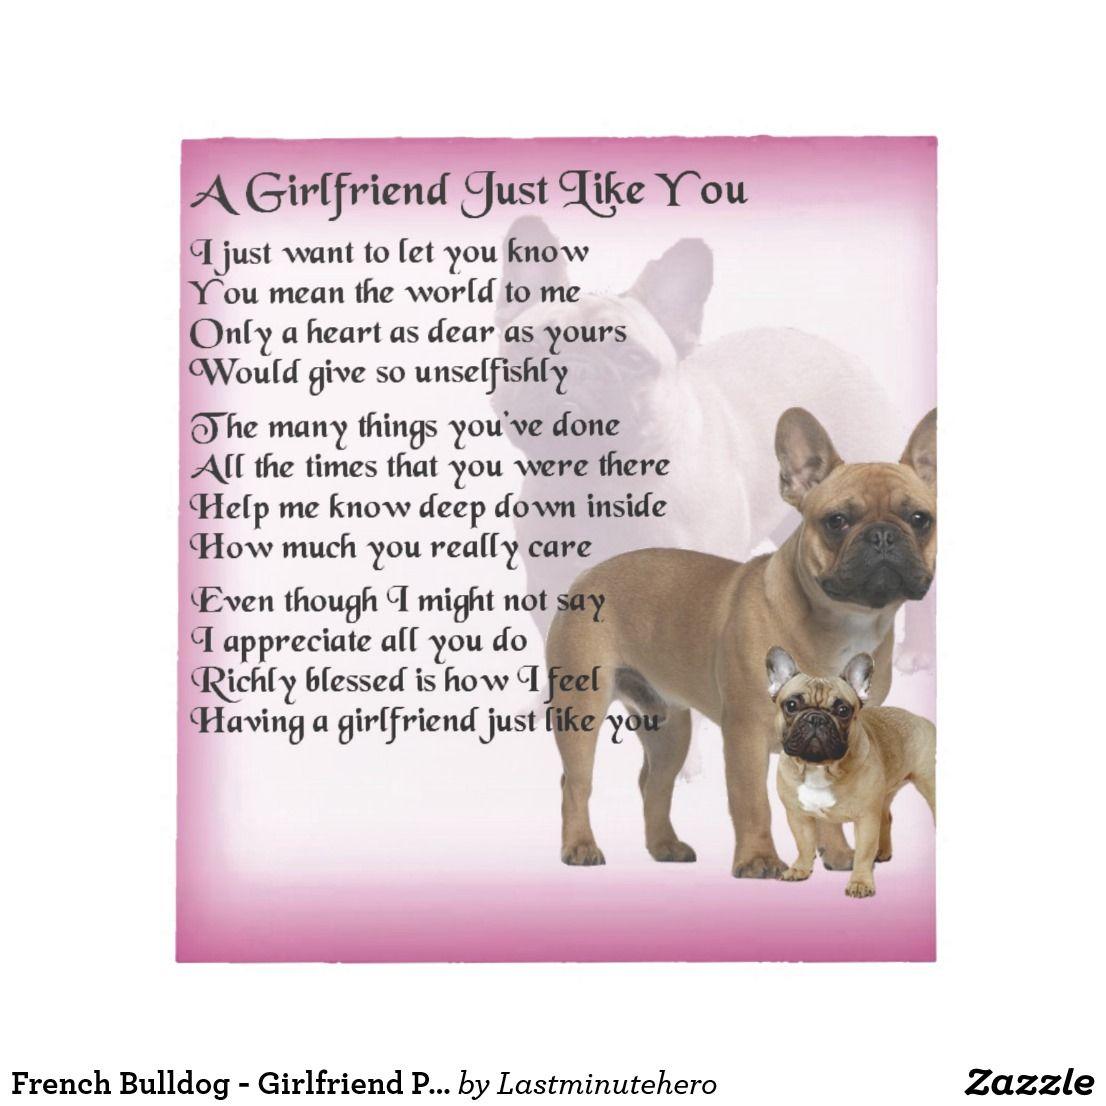 French Bulldog Girlfriend Poem Notepad Zazzle.co.uk